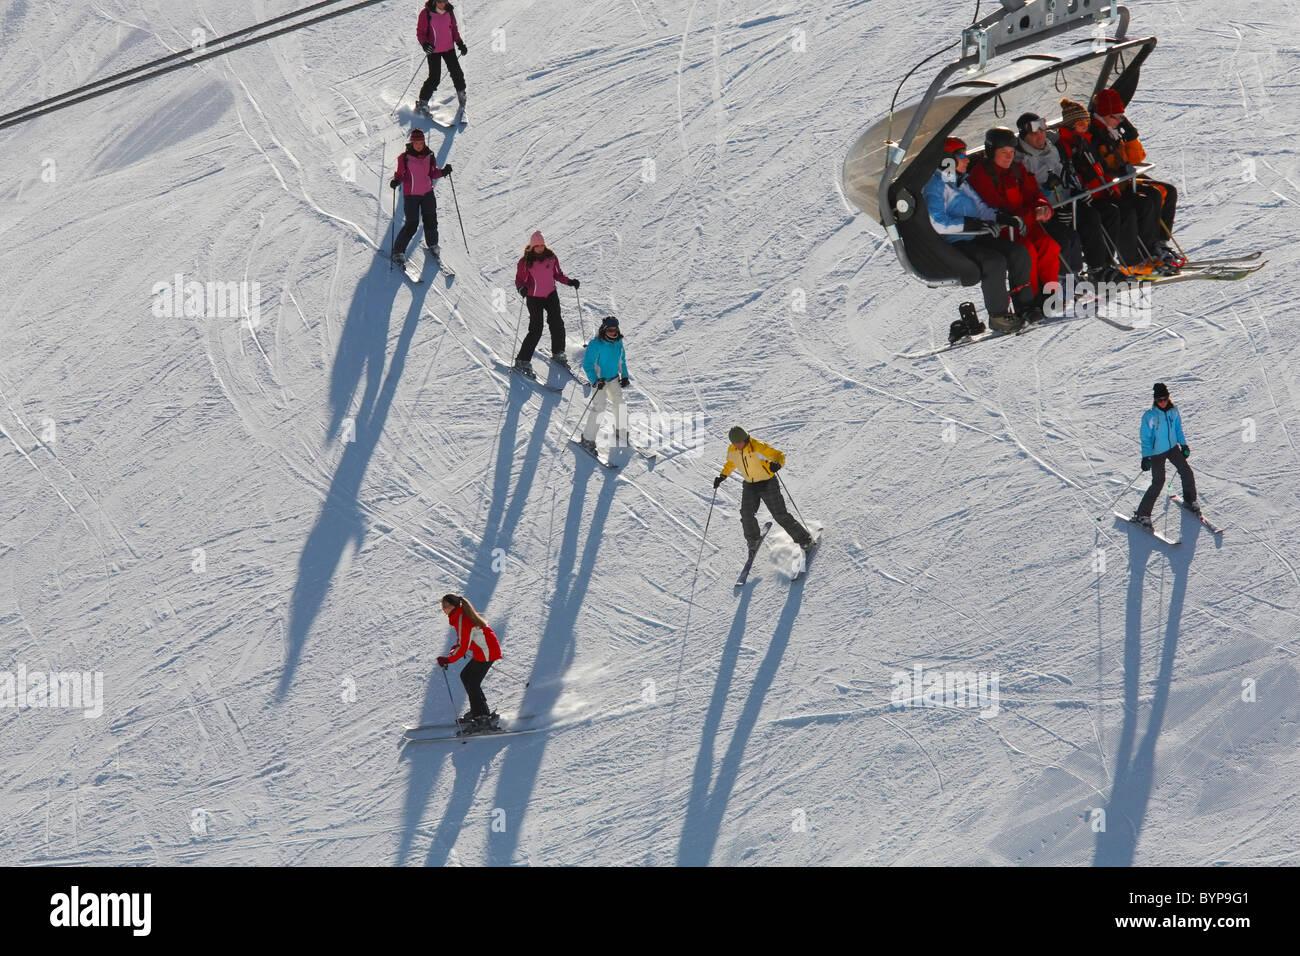 Ski school, Zillertal, Austria, Europe - Stock Image